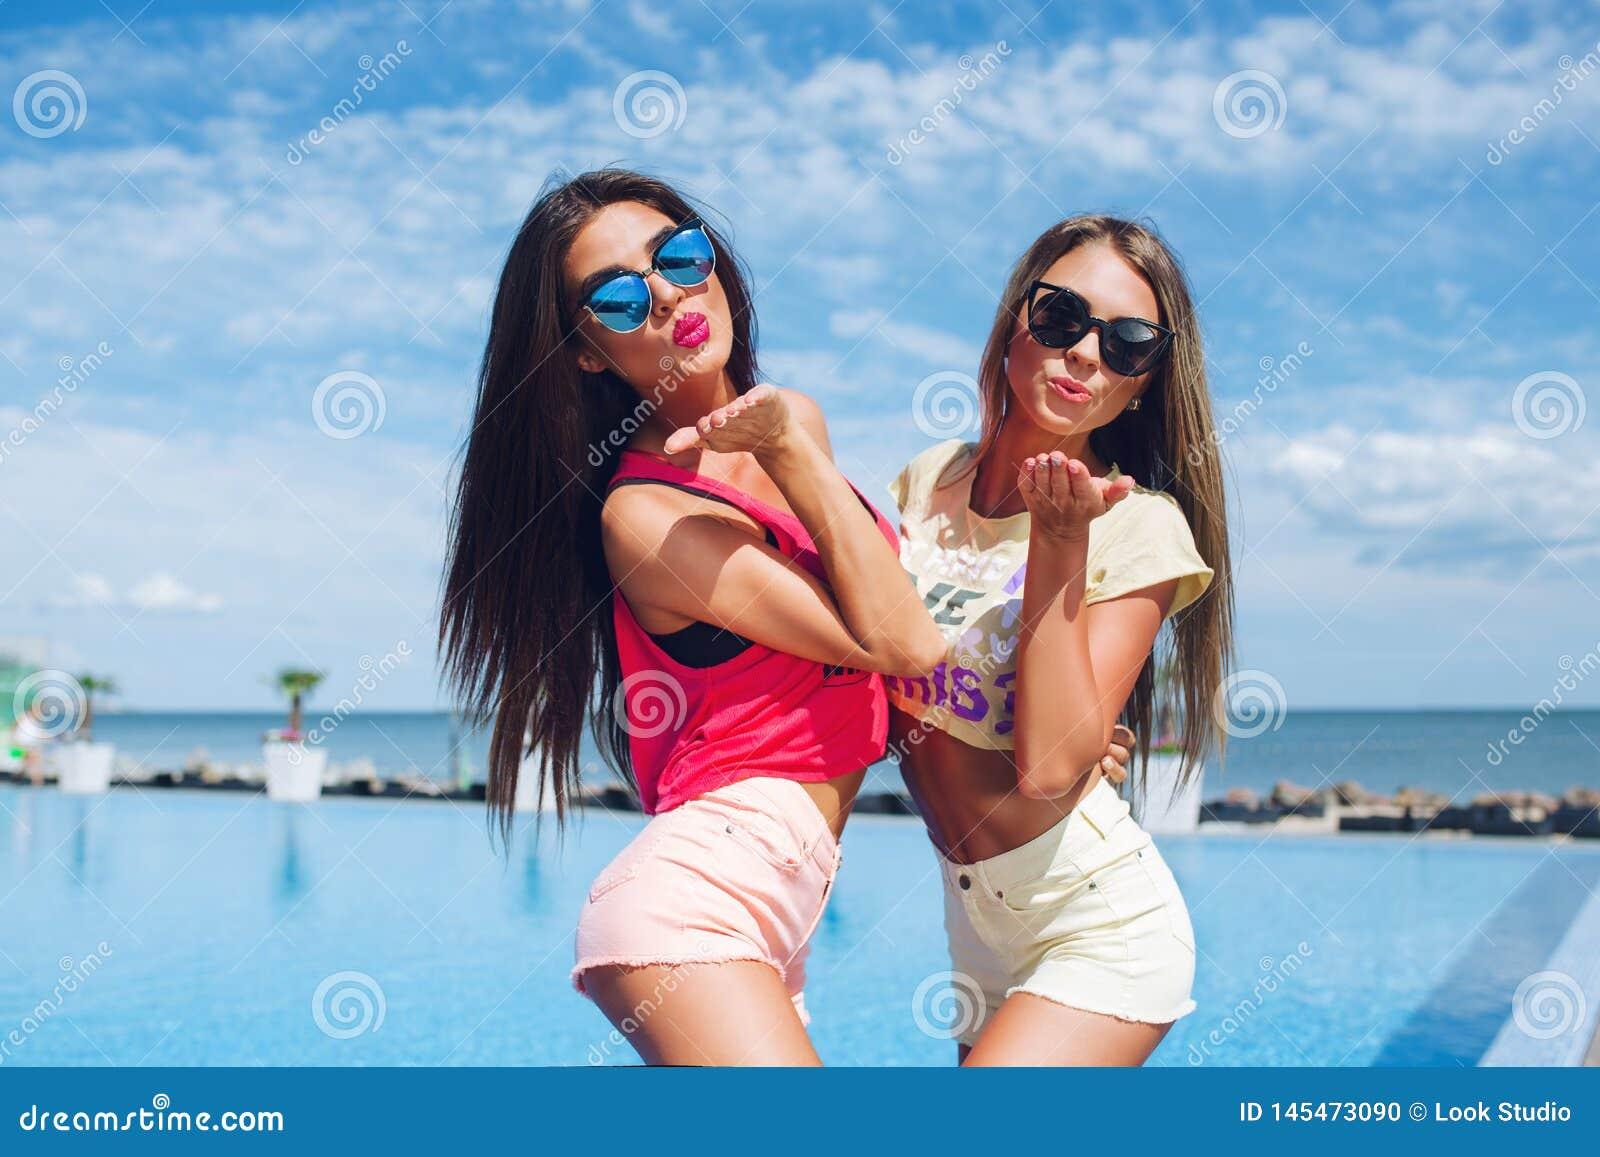 7 929 Girl Short Shorts Photos Free Royalty Free Stock Photos From Dreamstime